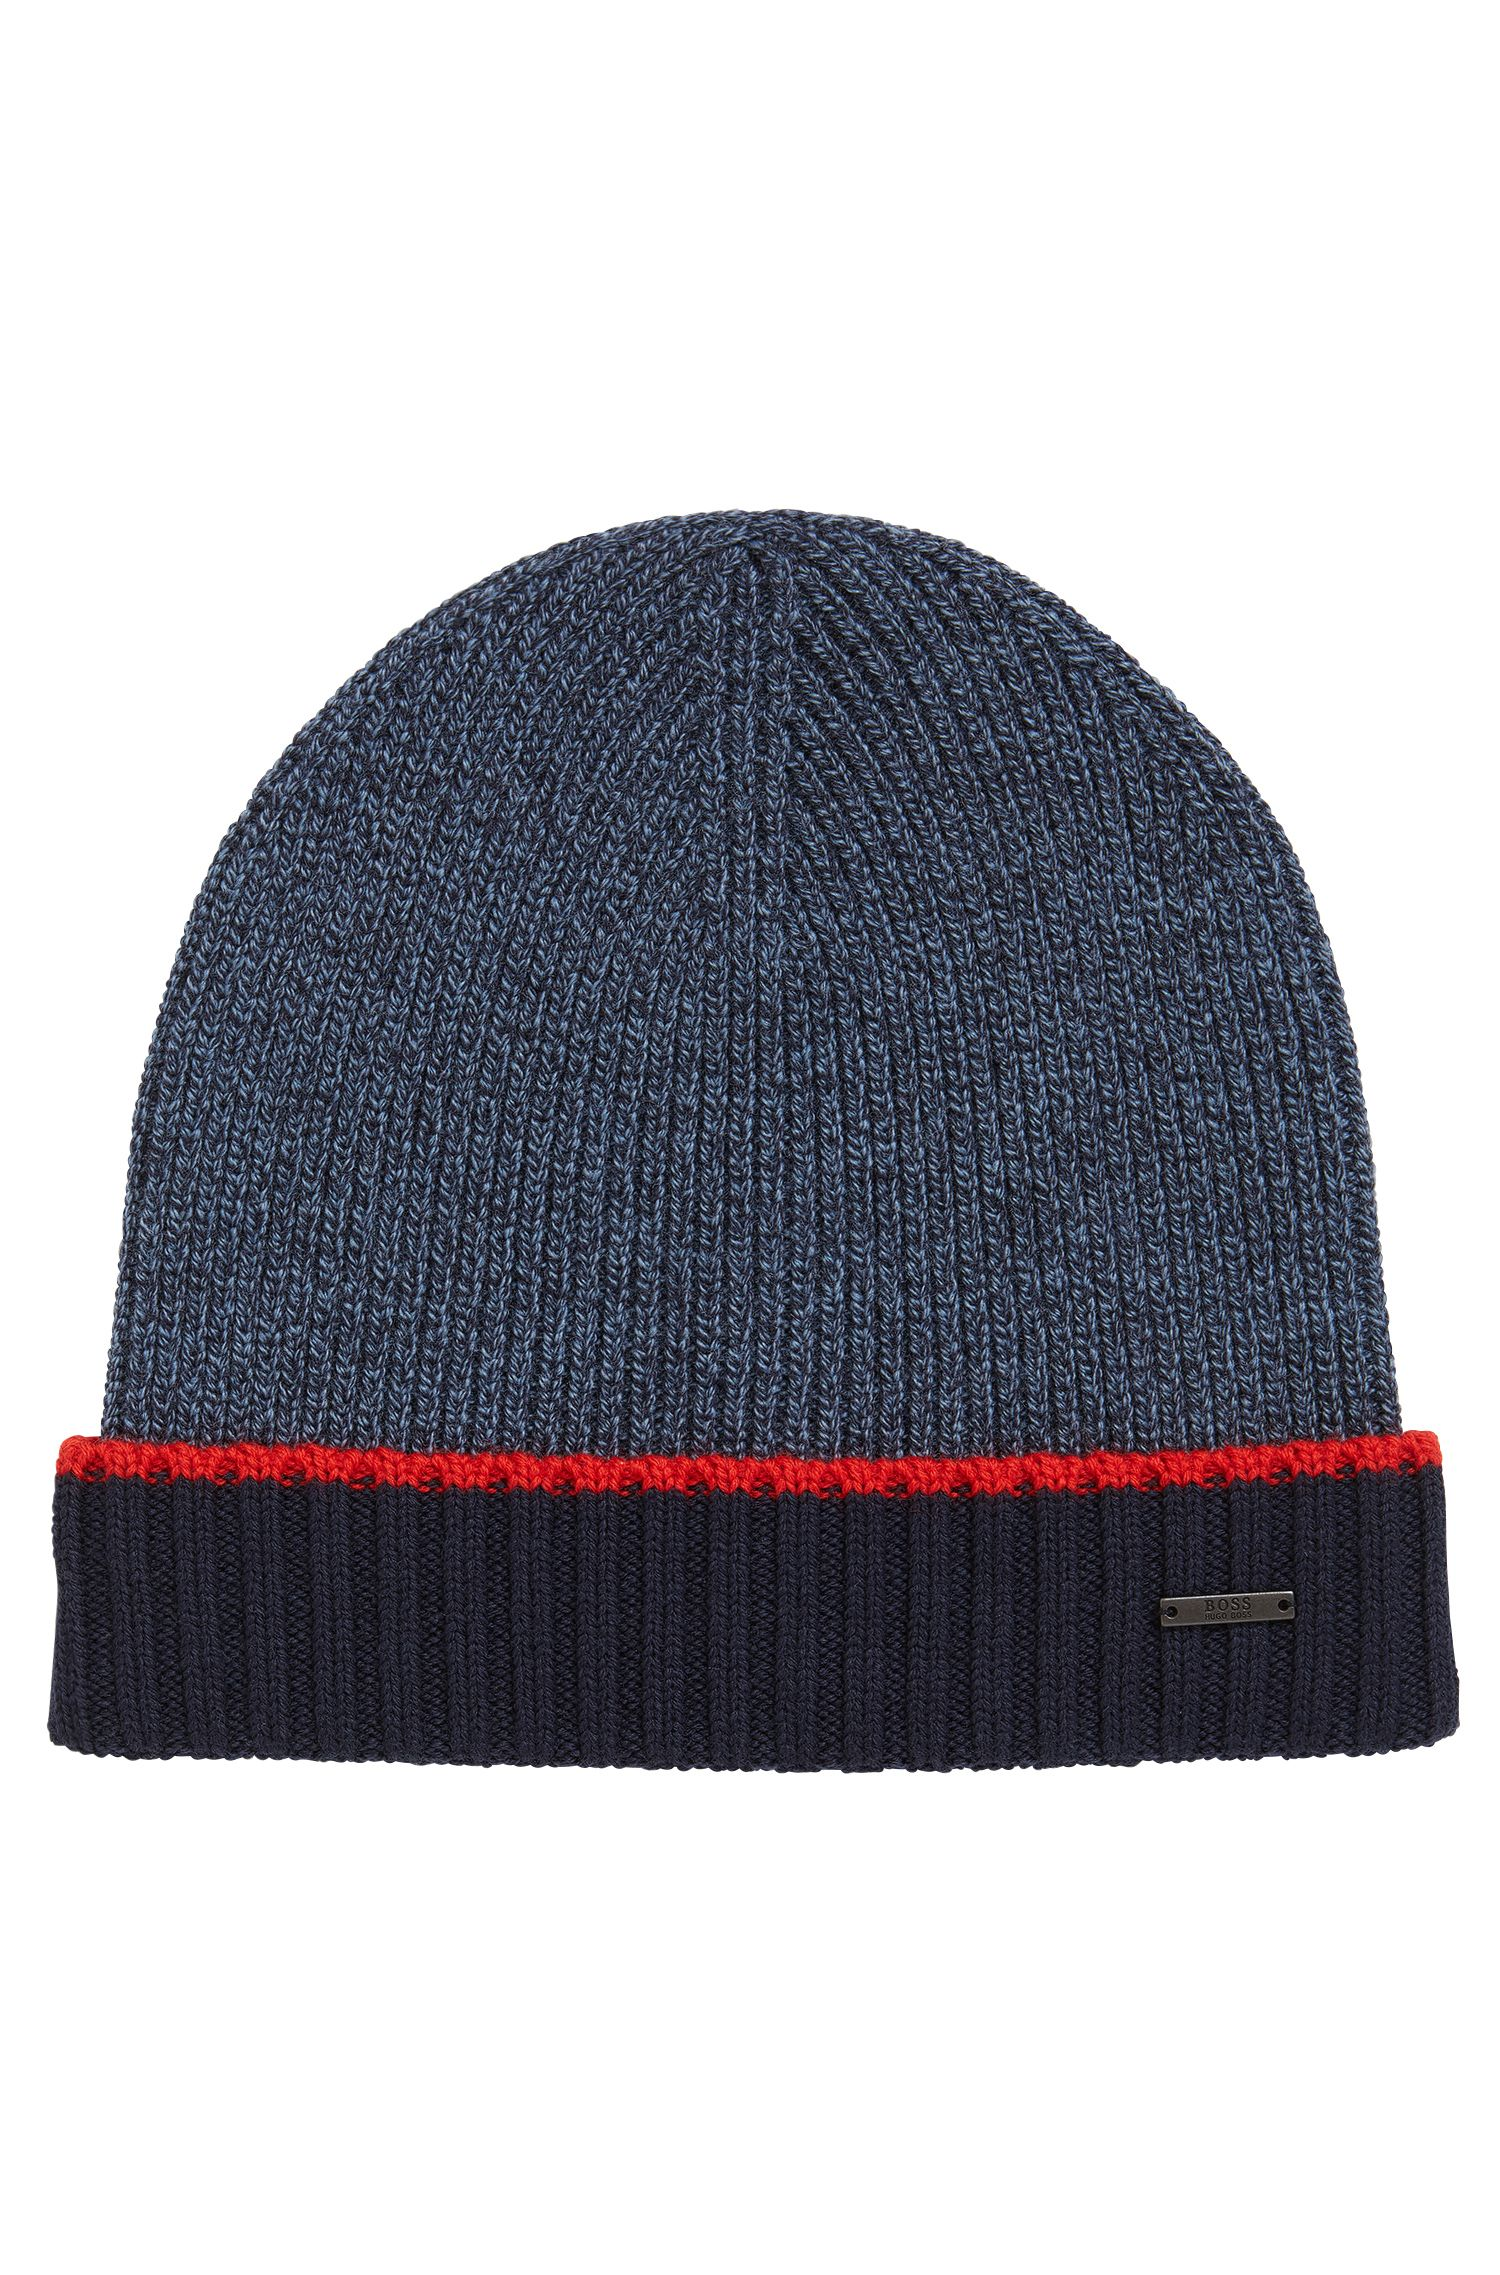 Virgin Wool Beanie | Frisk